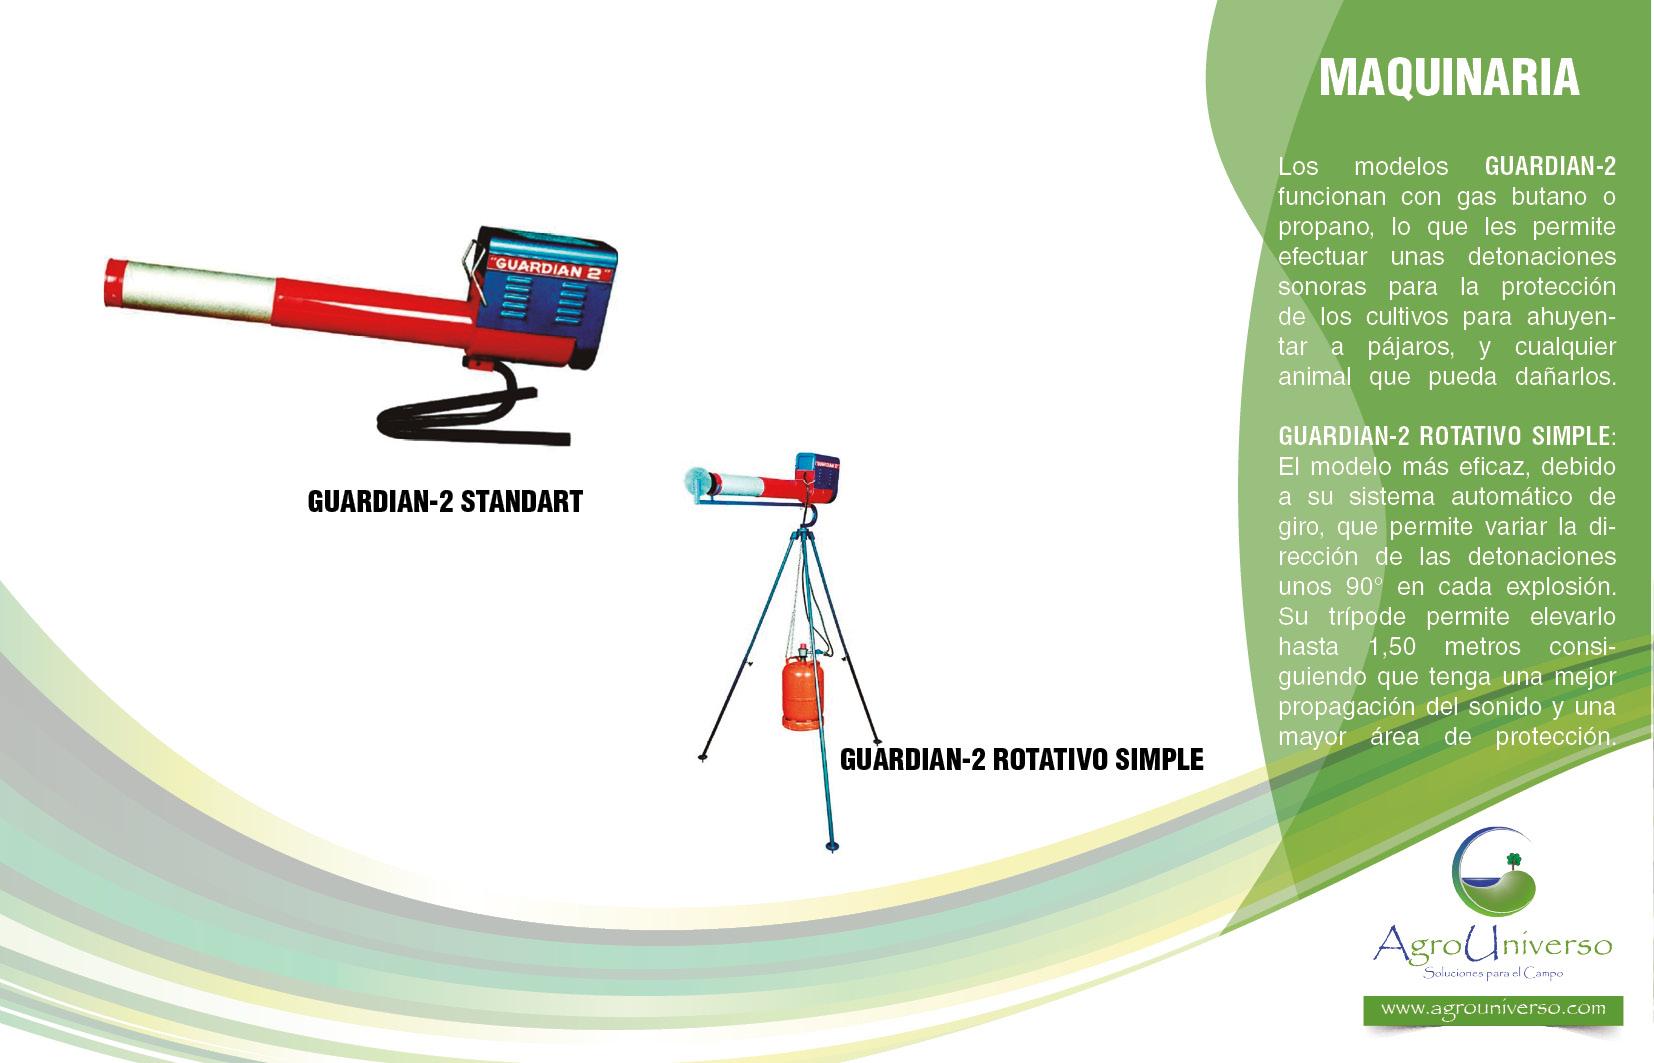 Catlogo-de-productos-Agrouniverso-28